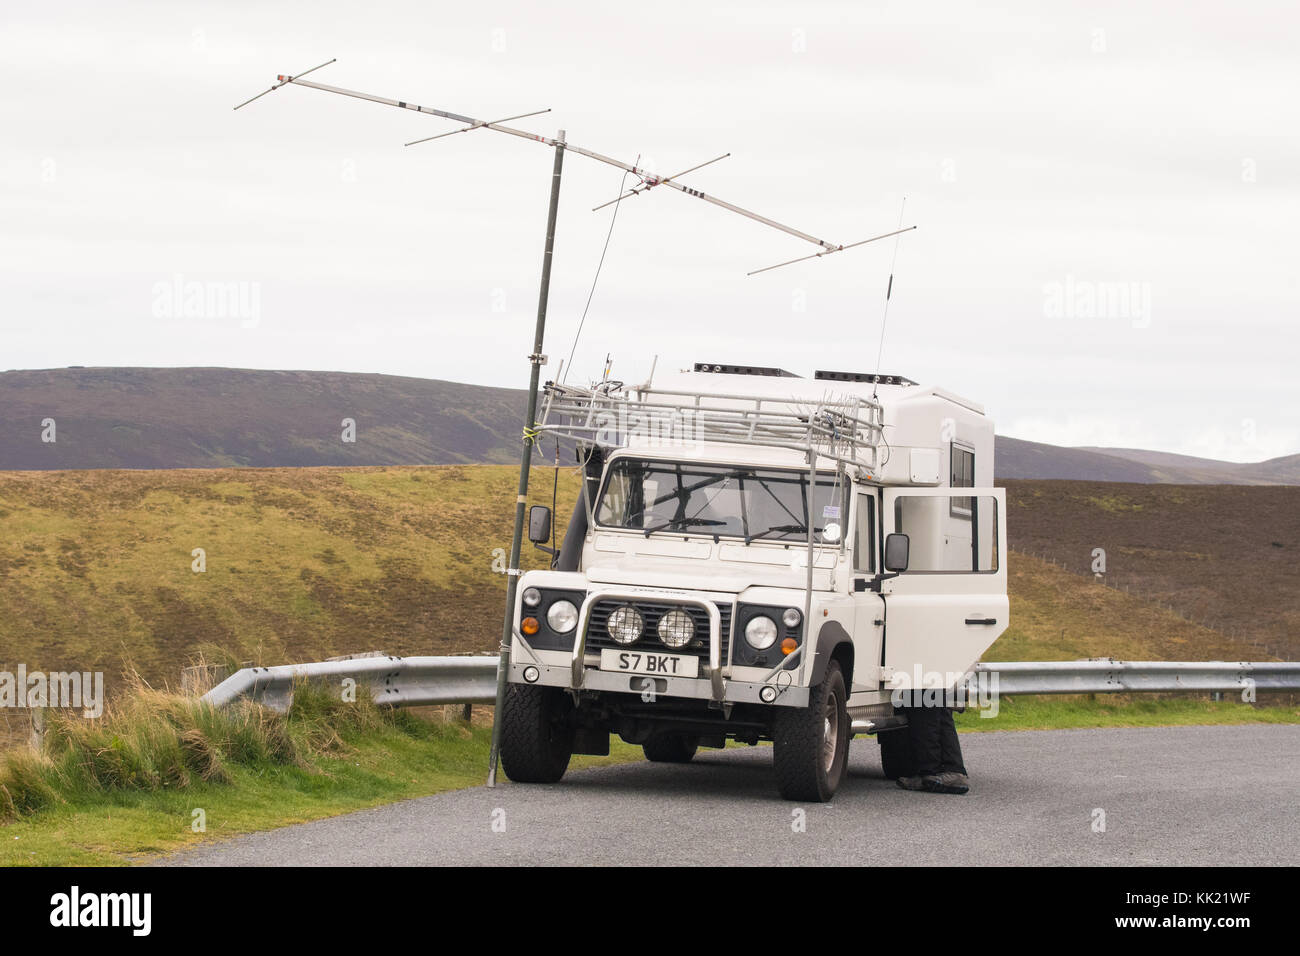 Ham radio enthusiast in remote location, Shetland Islands, Scotland, UK - Stock Image